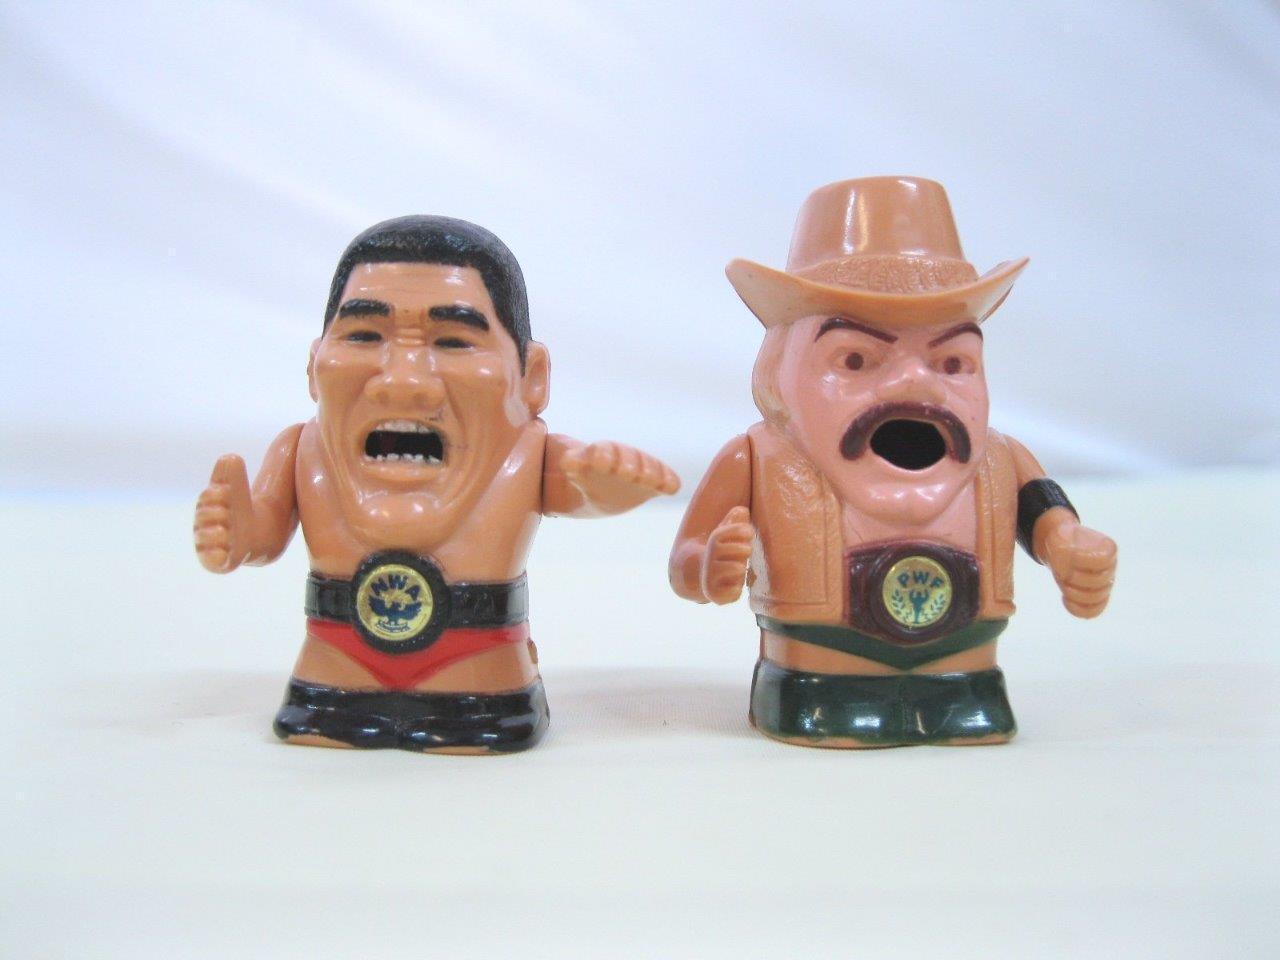 Stan Hansen et GIANT baba vintage toy figure Japan FPG Ceinture AJPW NJPW Wcw Wwf